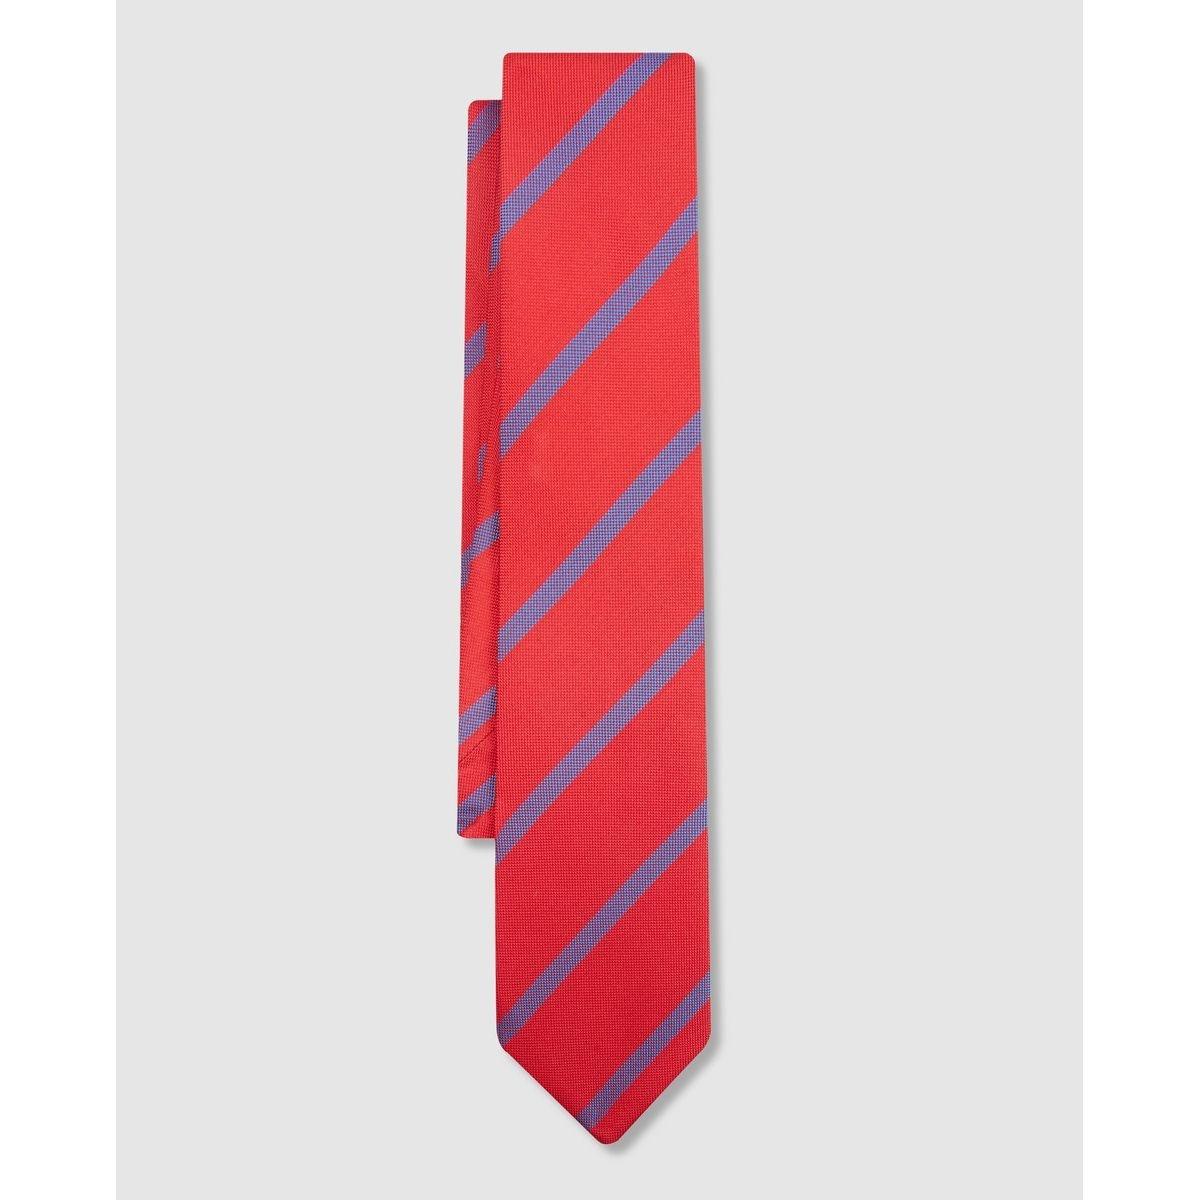 Cravate en soie imprimé rayures